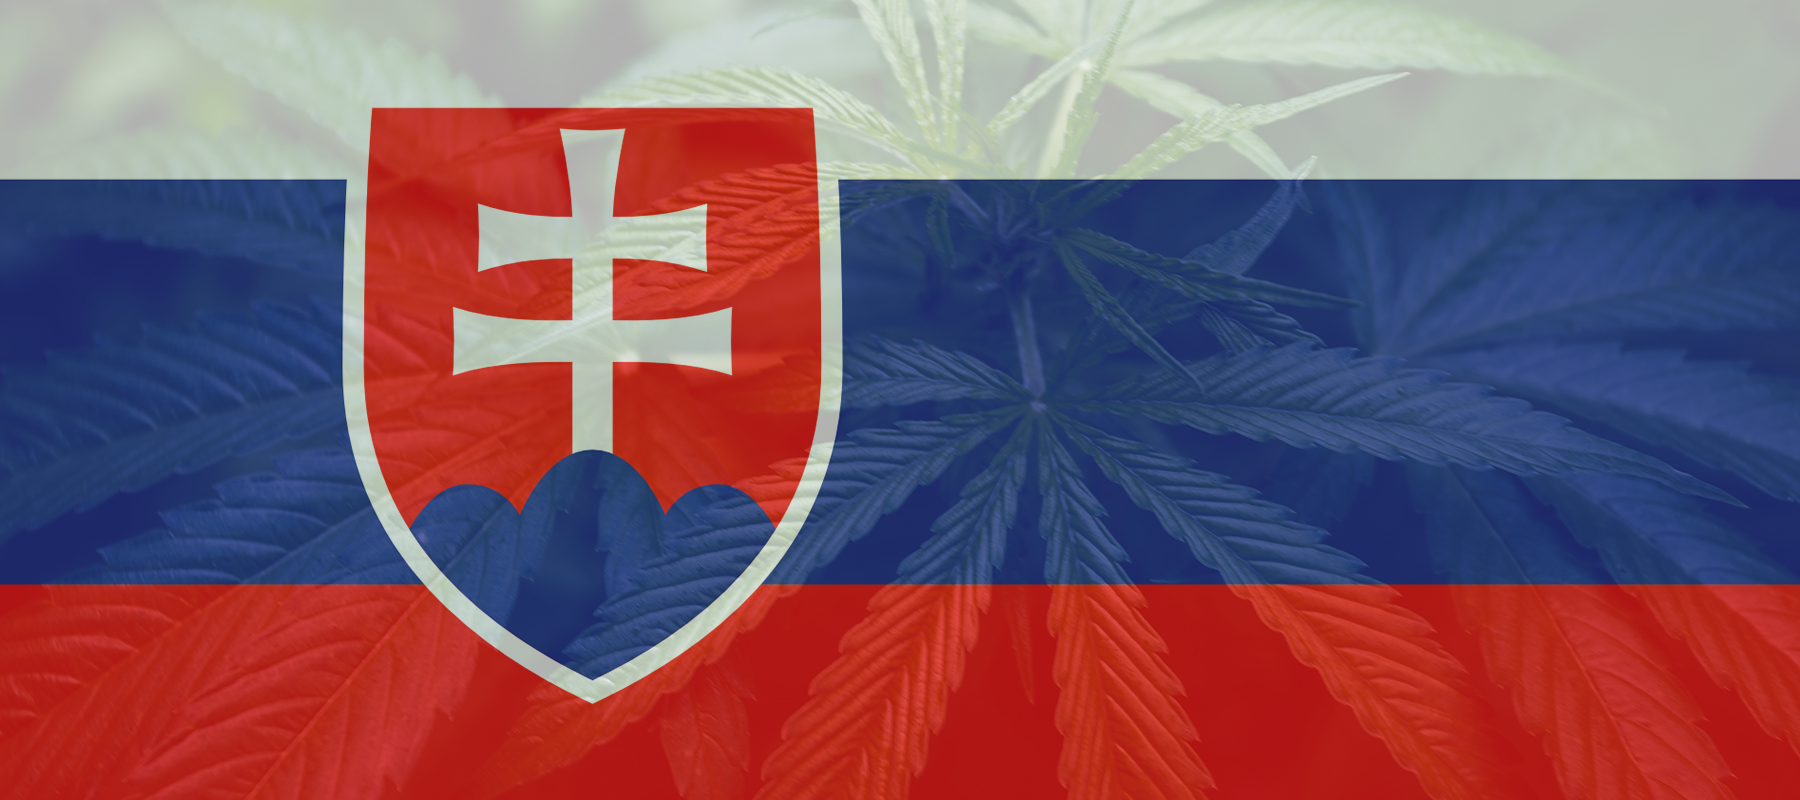 Is Hemp & CBD Legal in Slovakia?